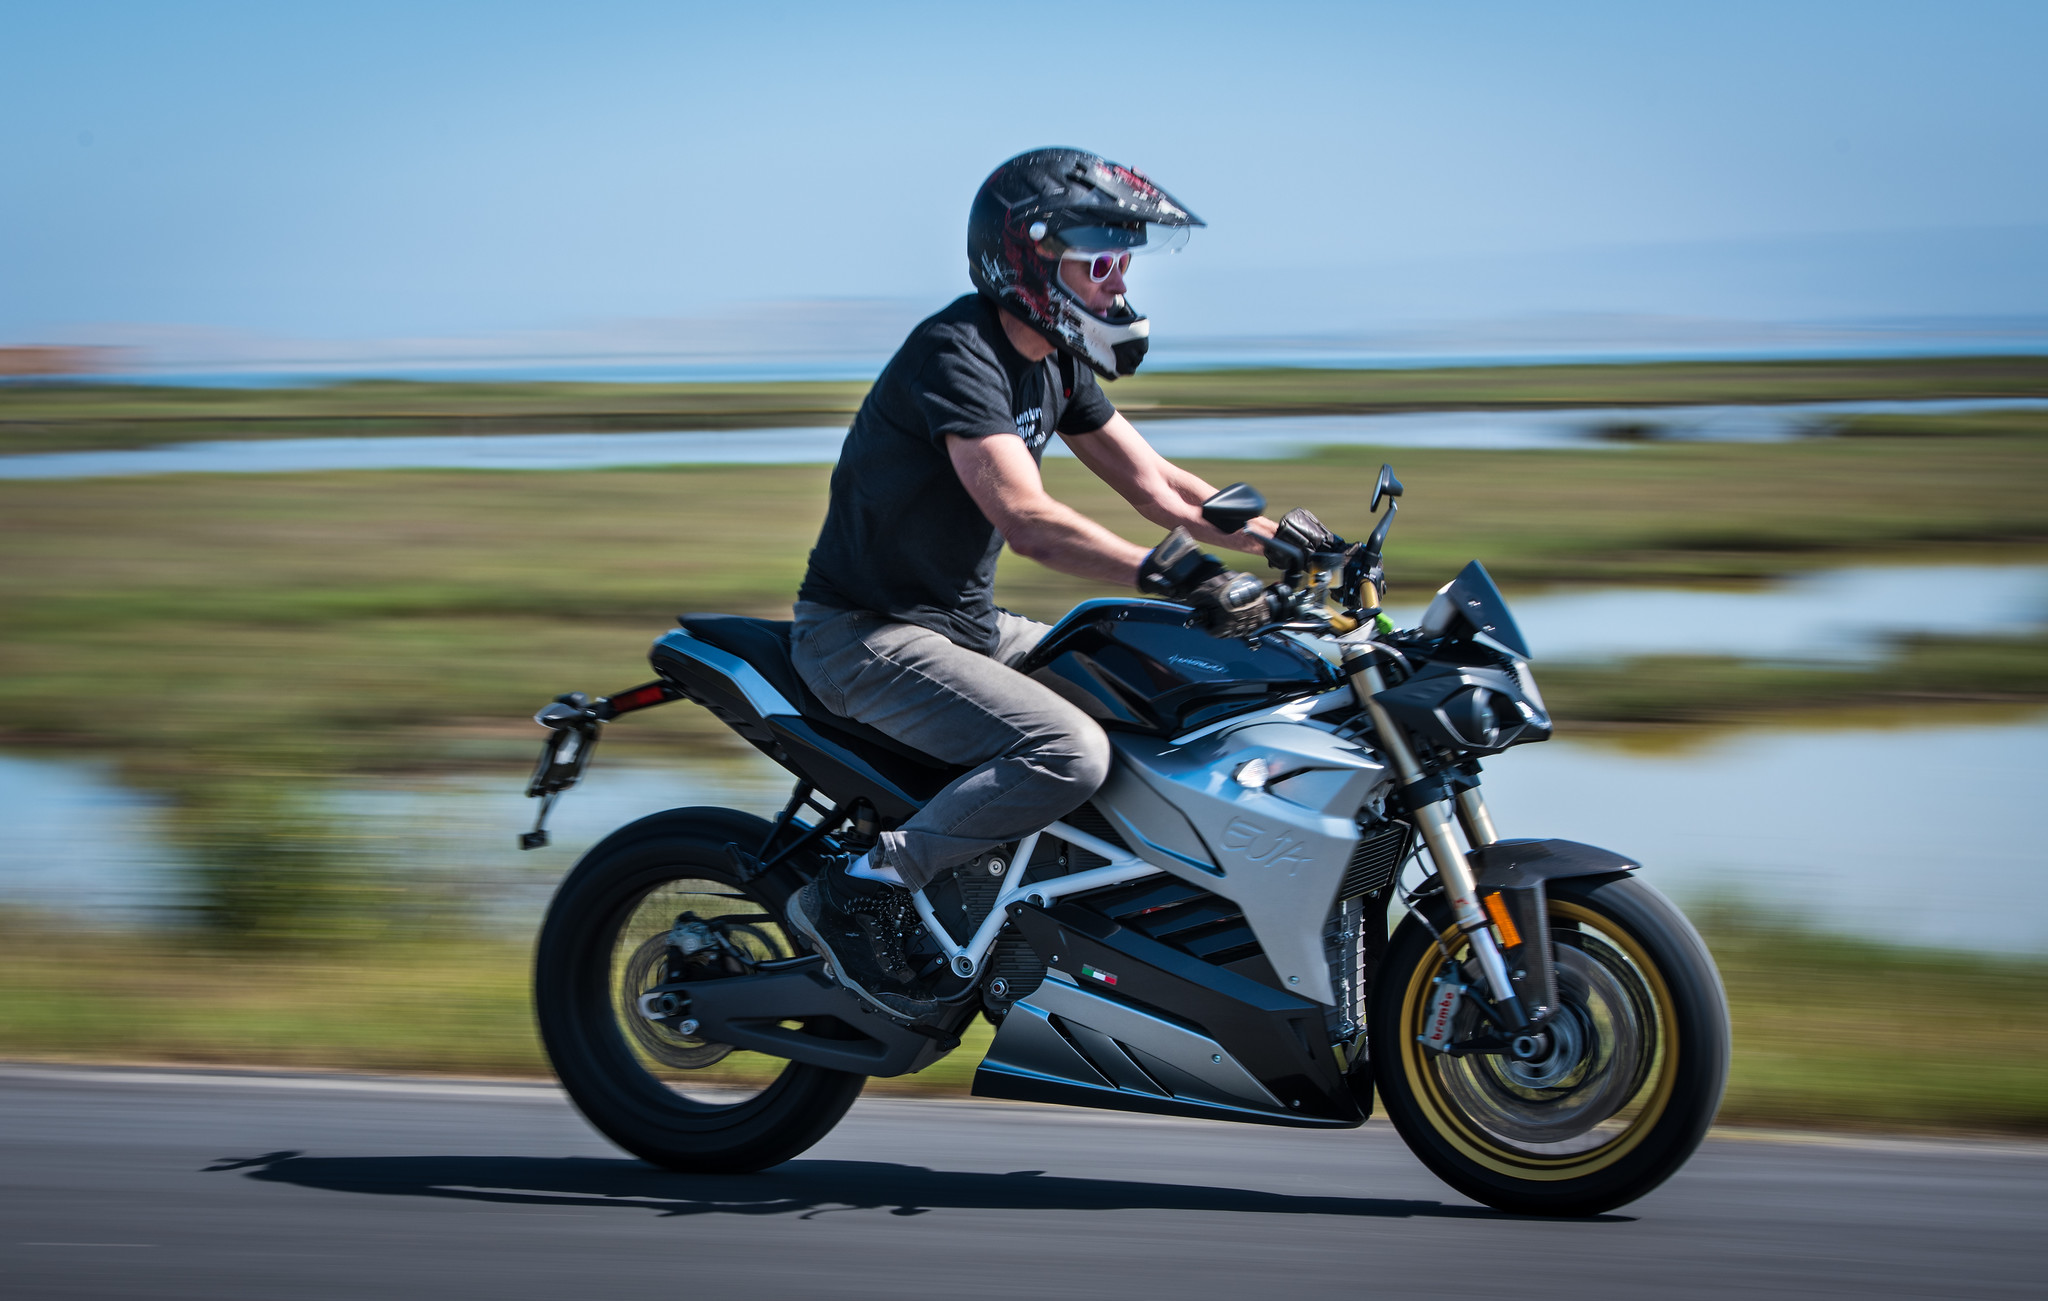 Chris-MacAskill-Baldy-ADV-Forum-Adventure-Rider-Radio-Motorcycle-Podcast-4.jpg